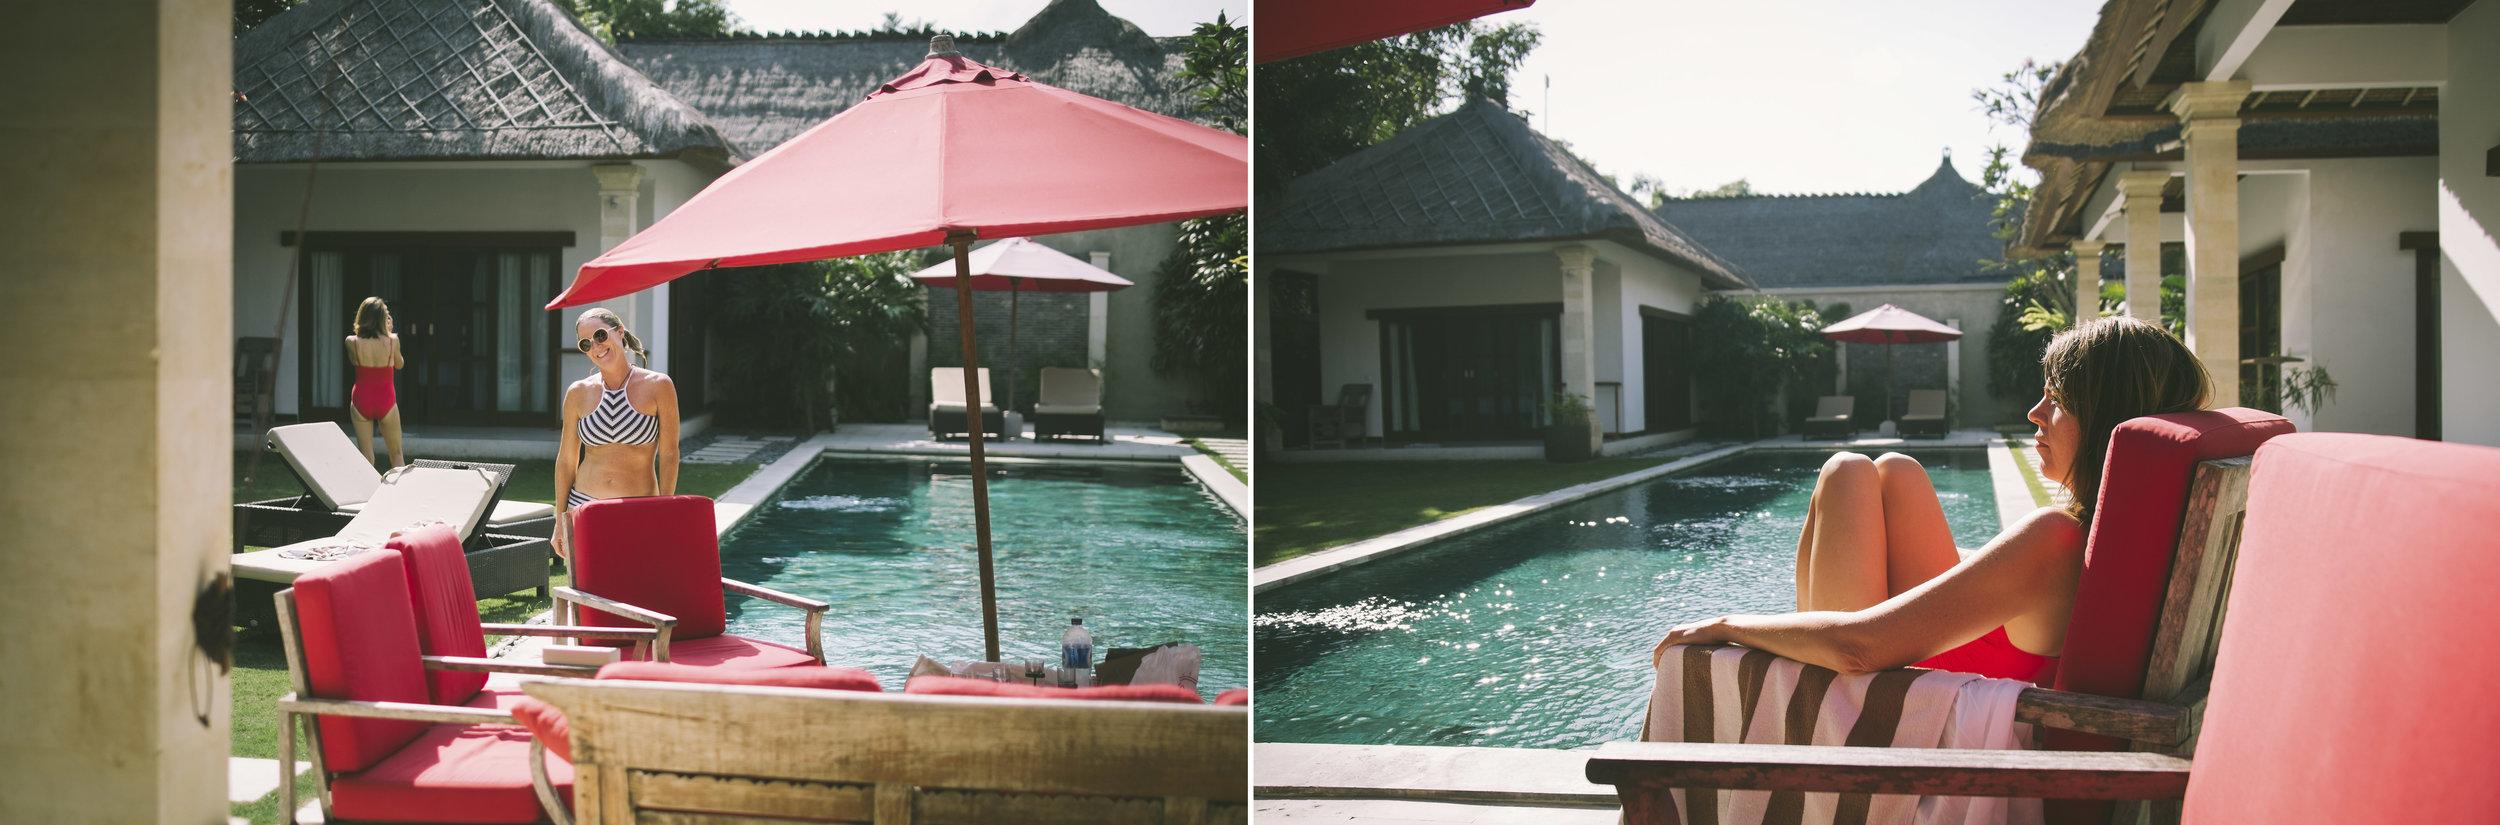 Bali (2and3).jpg